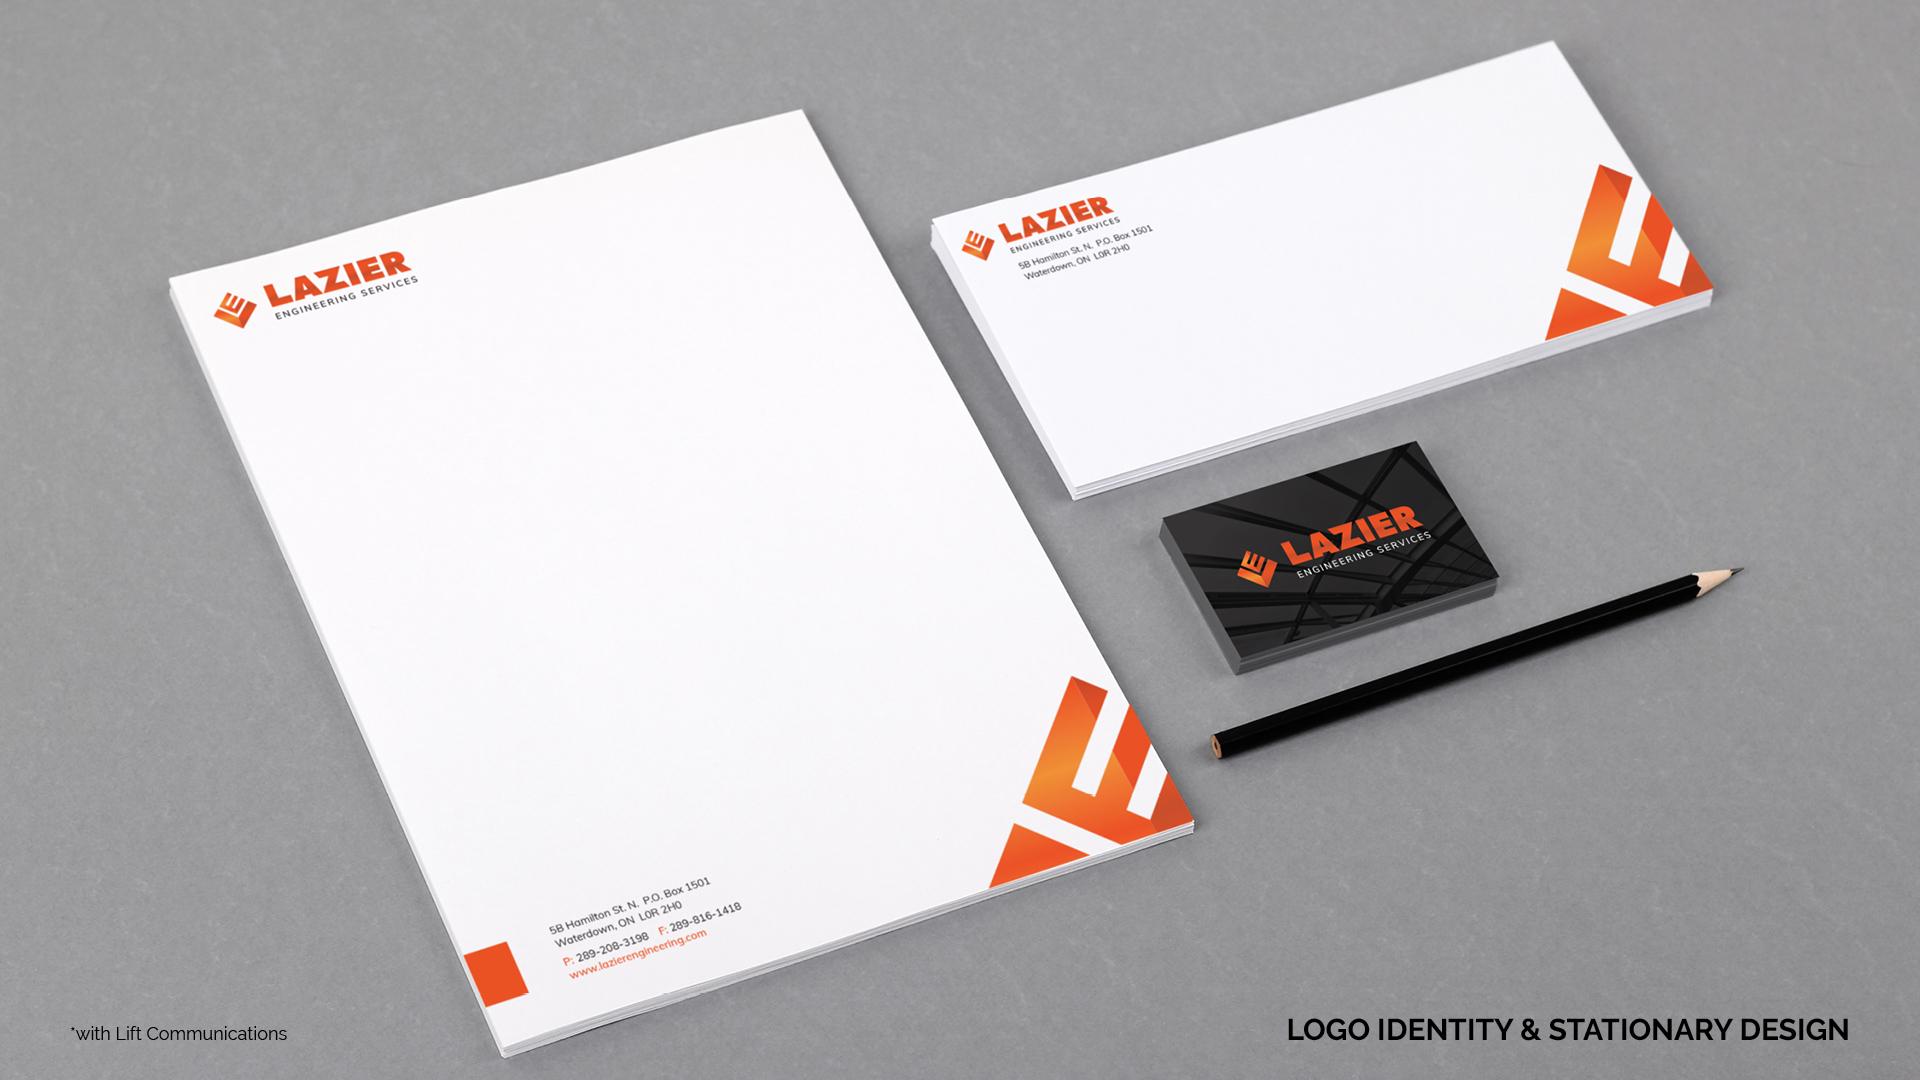 BD Lazier Branding.jpg